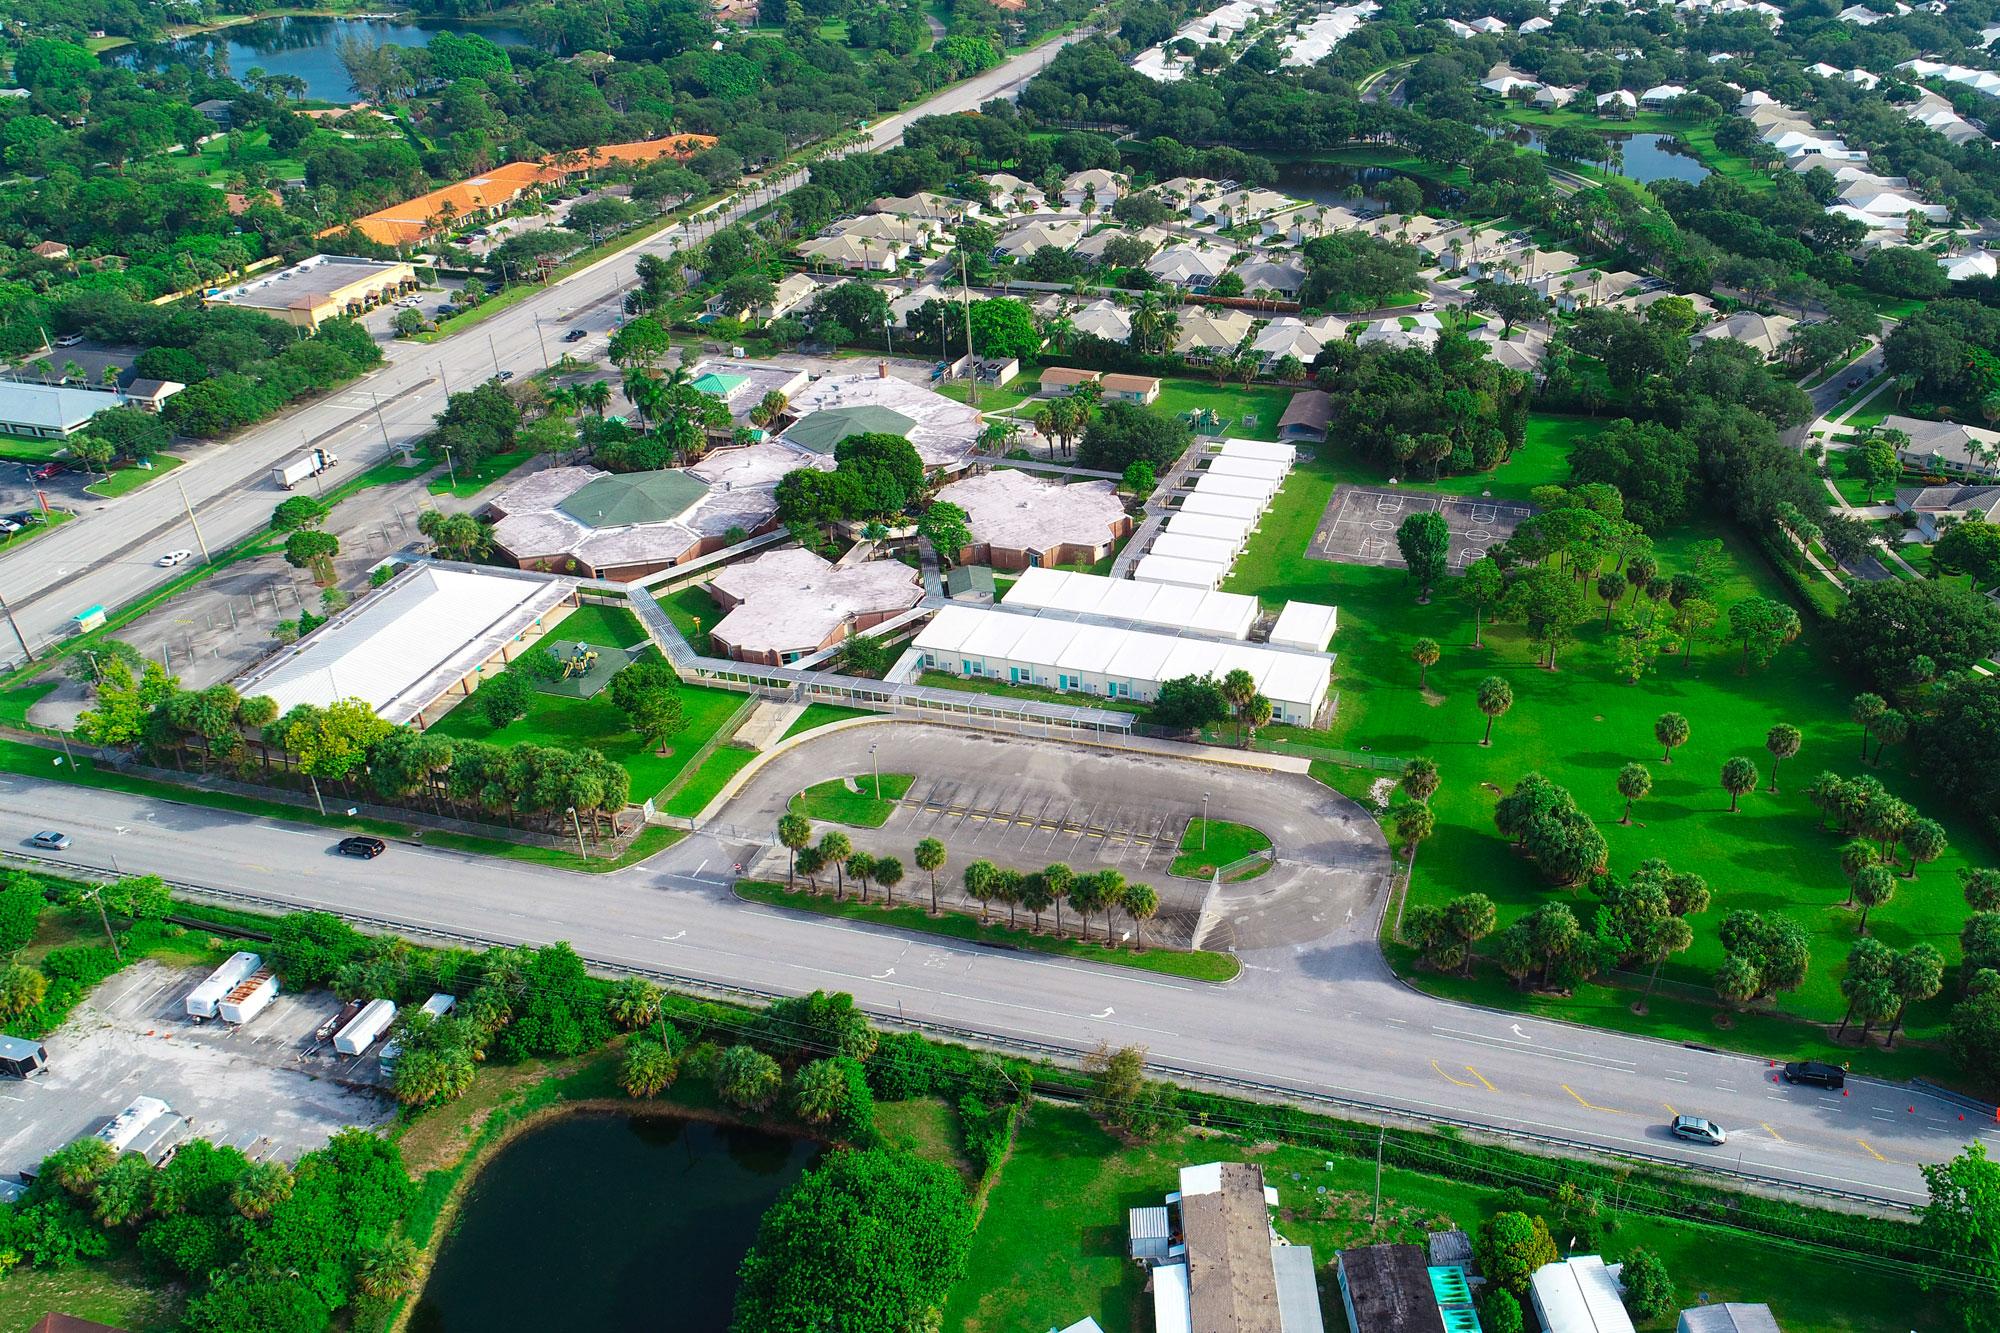 Grove Park Elementary School